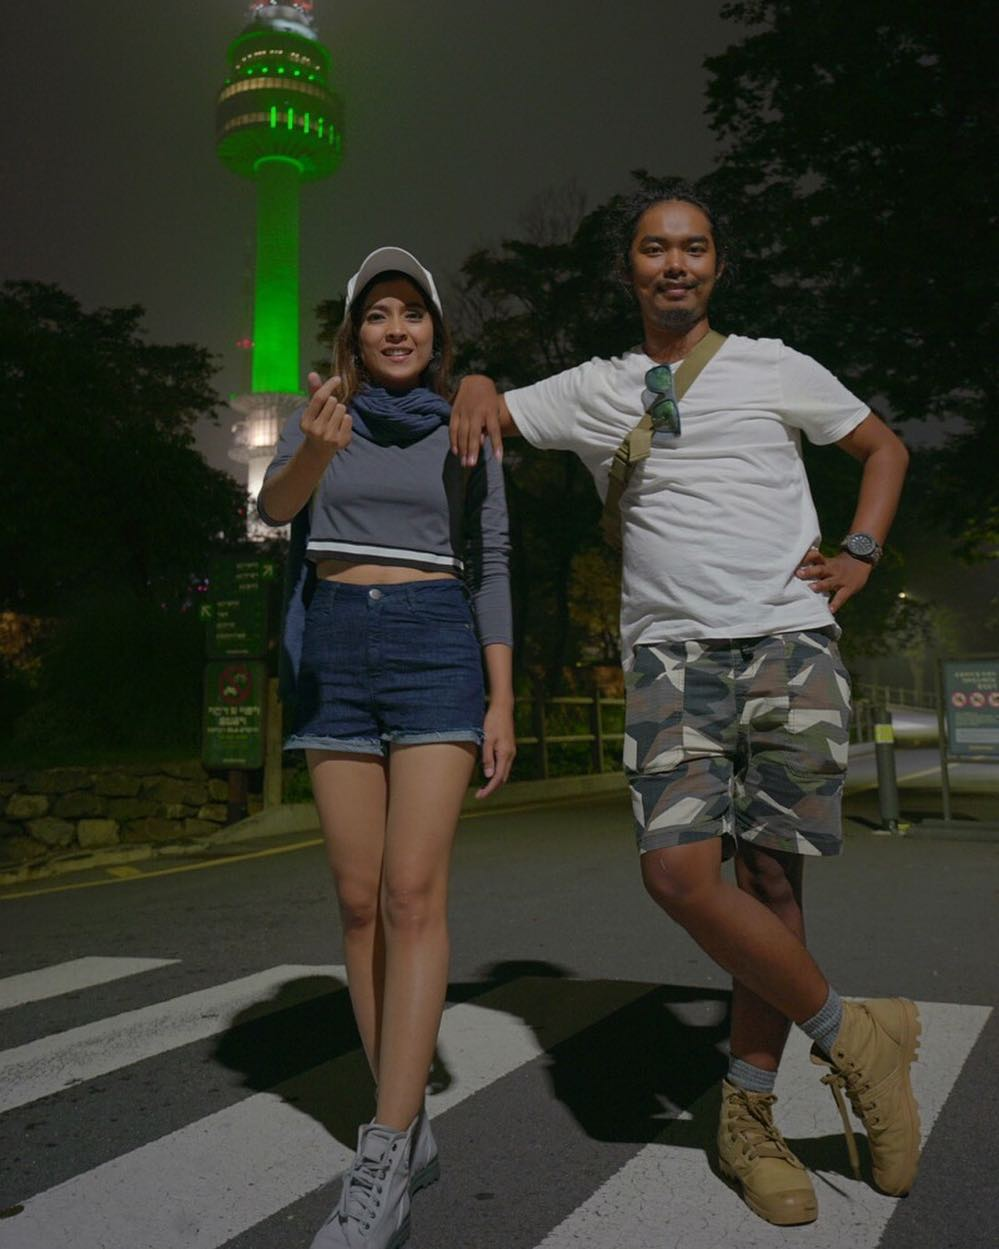 Momen mesra Dodit Mulyanto & kekasih   Instagram